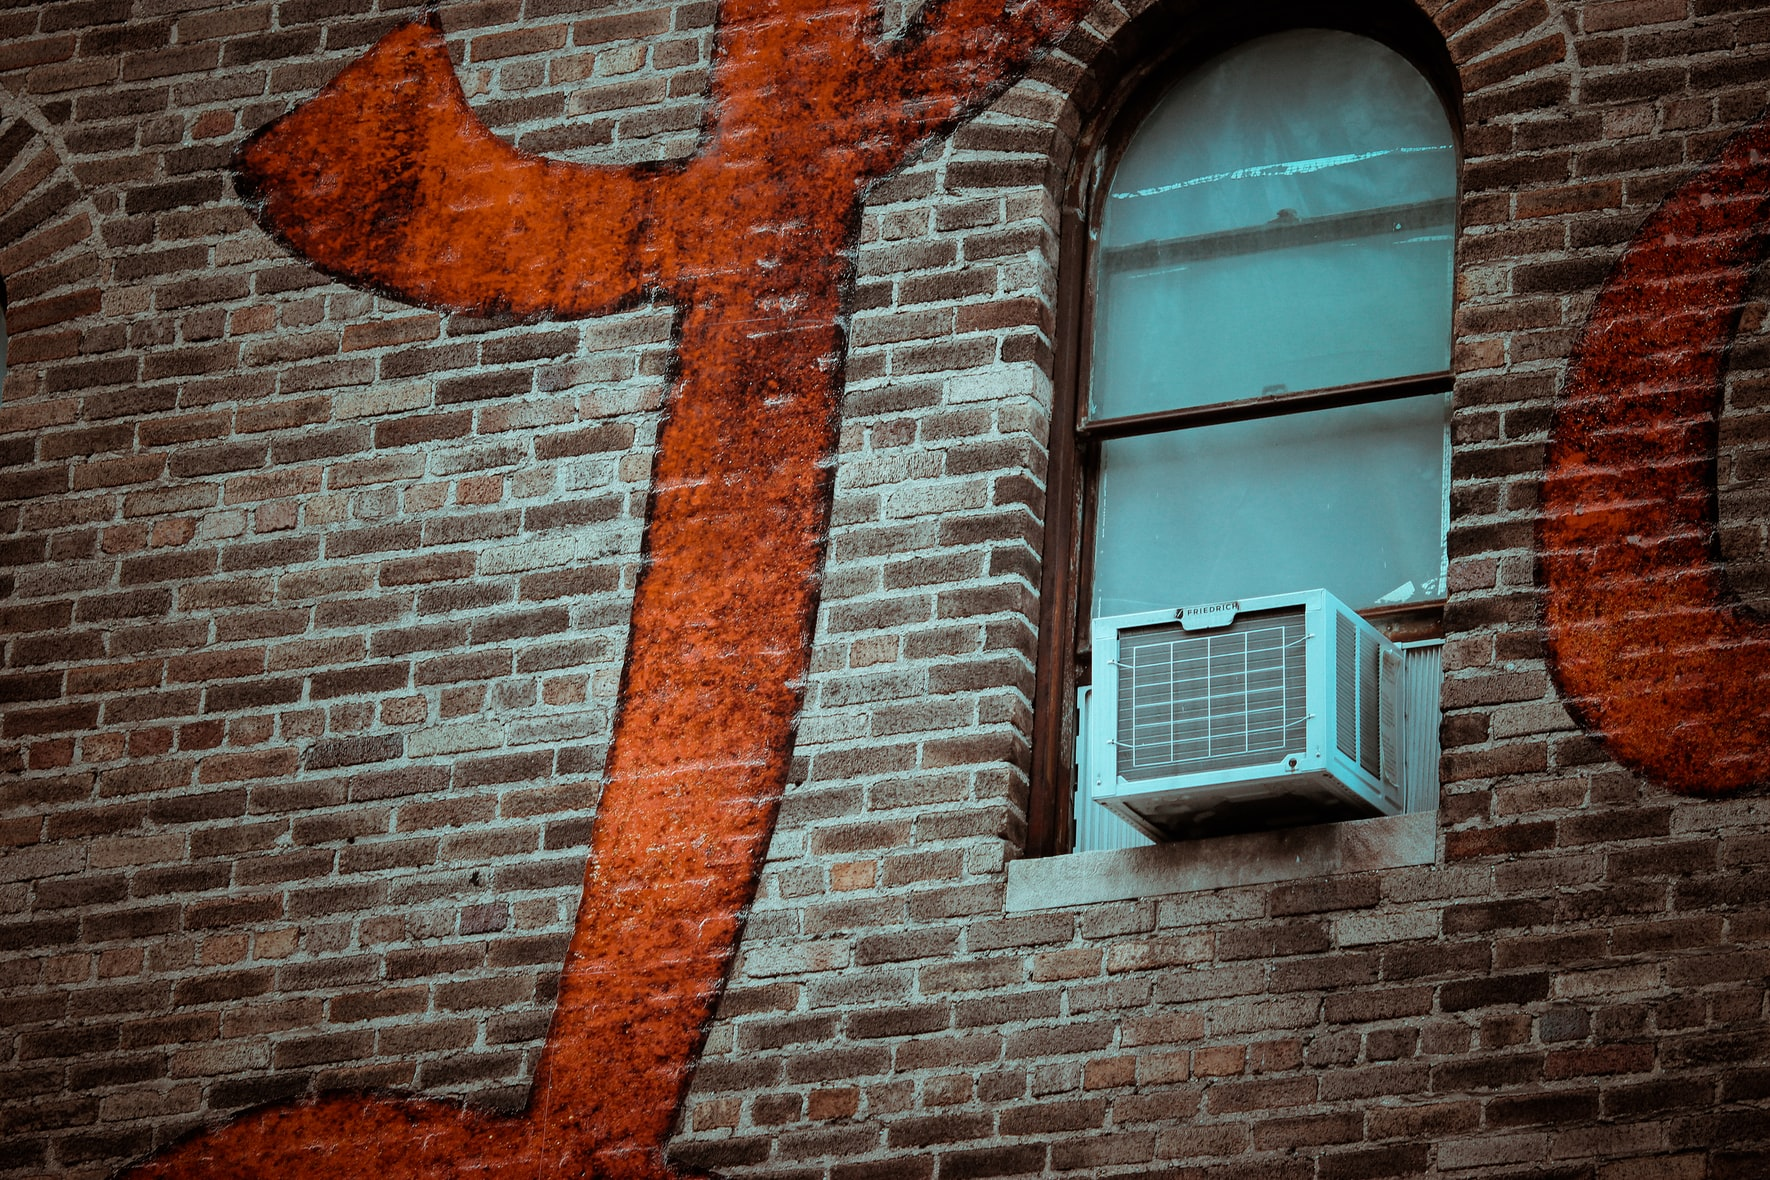 window air conditioner smells like urine